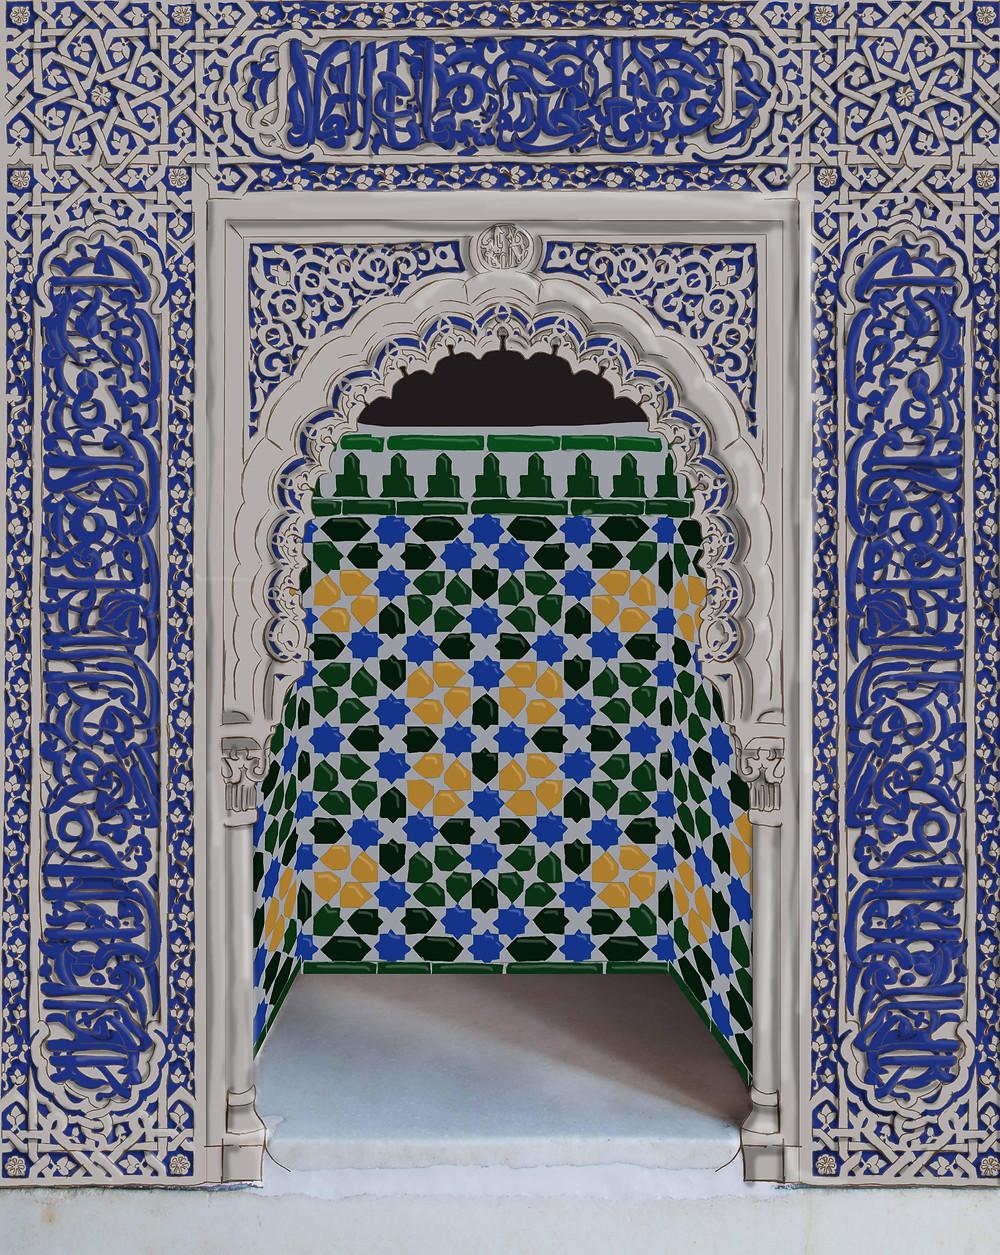 puerta alhambra2.jpg